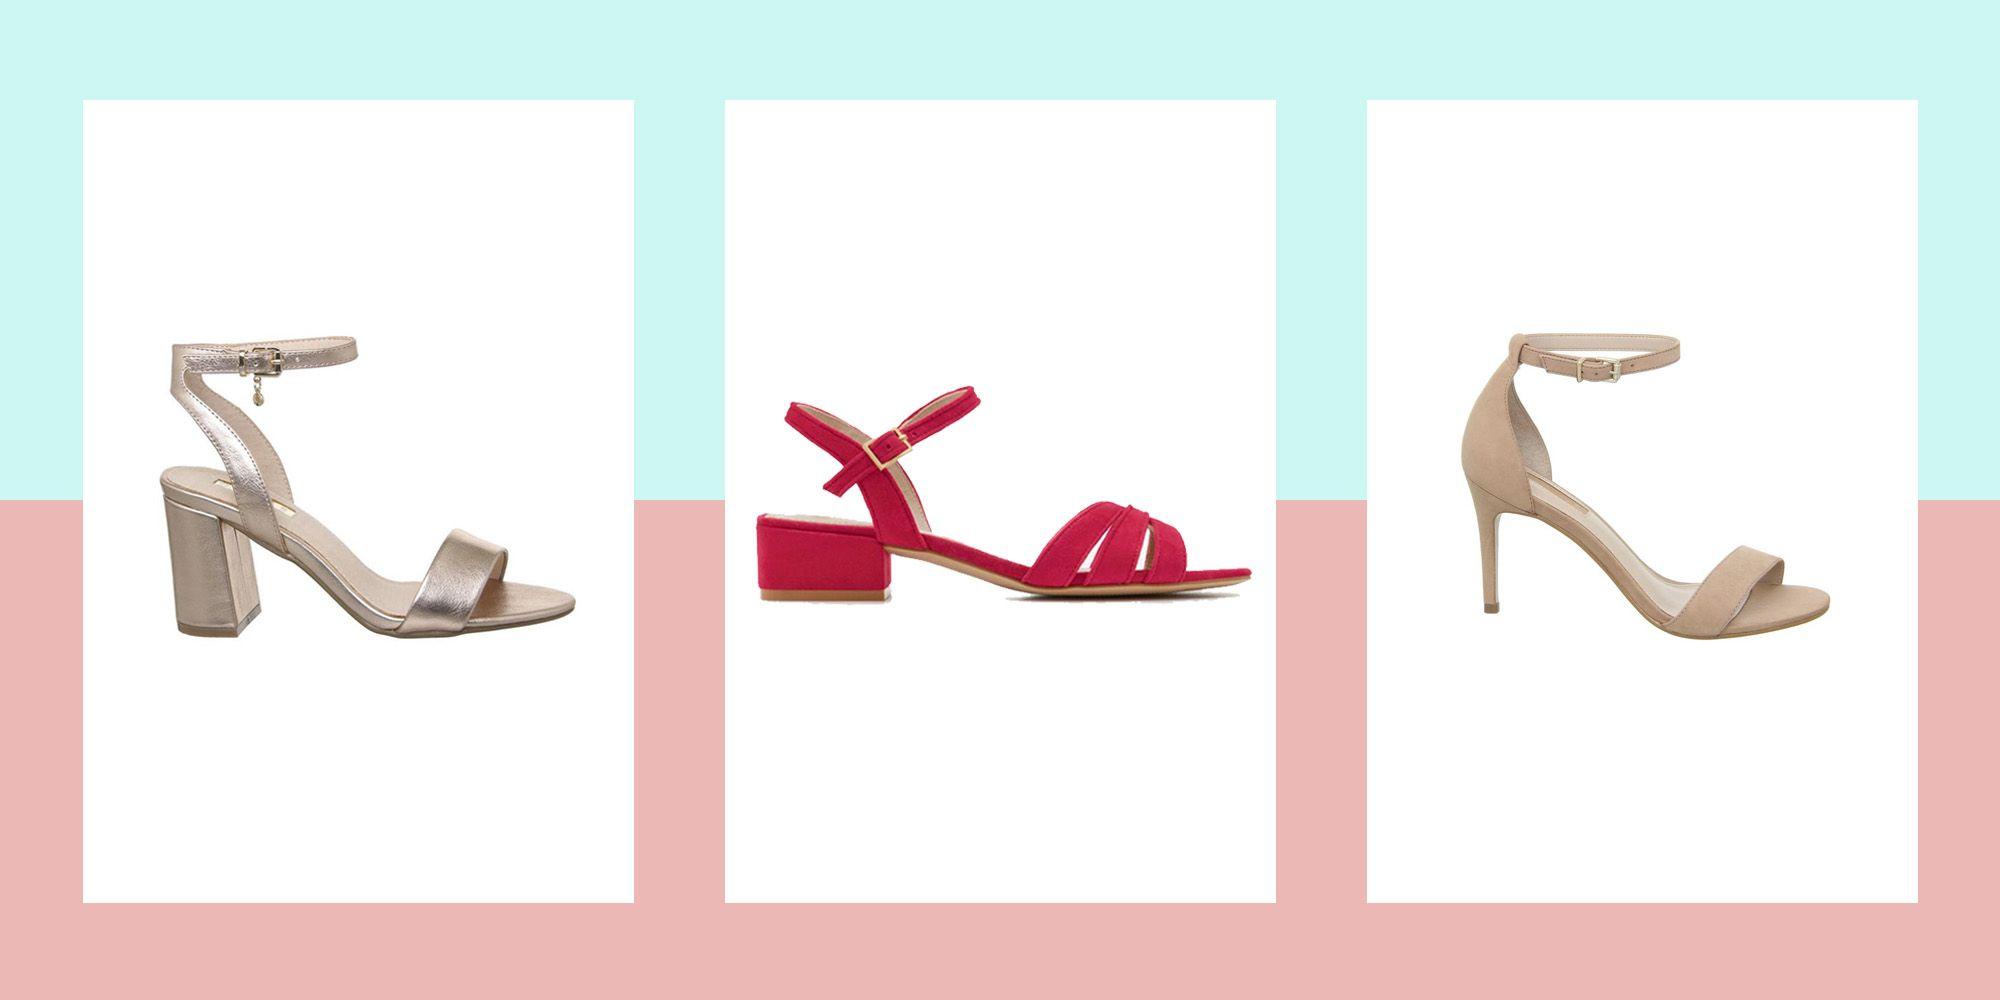 Summer Heeled For Sandals Heeled Sandals Best b7yYf6g